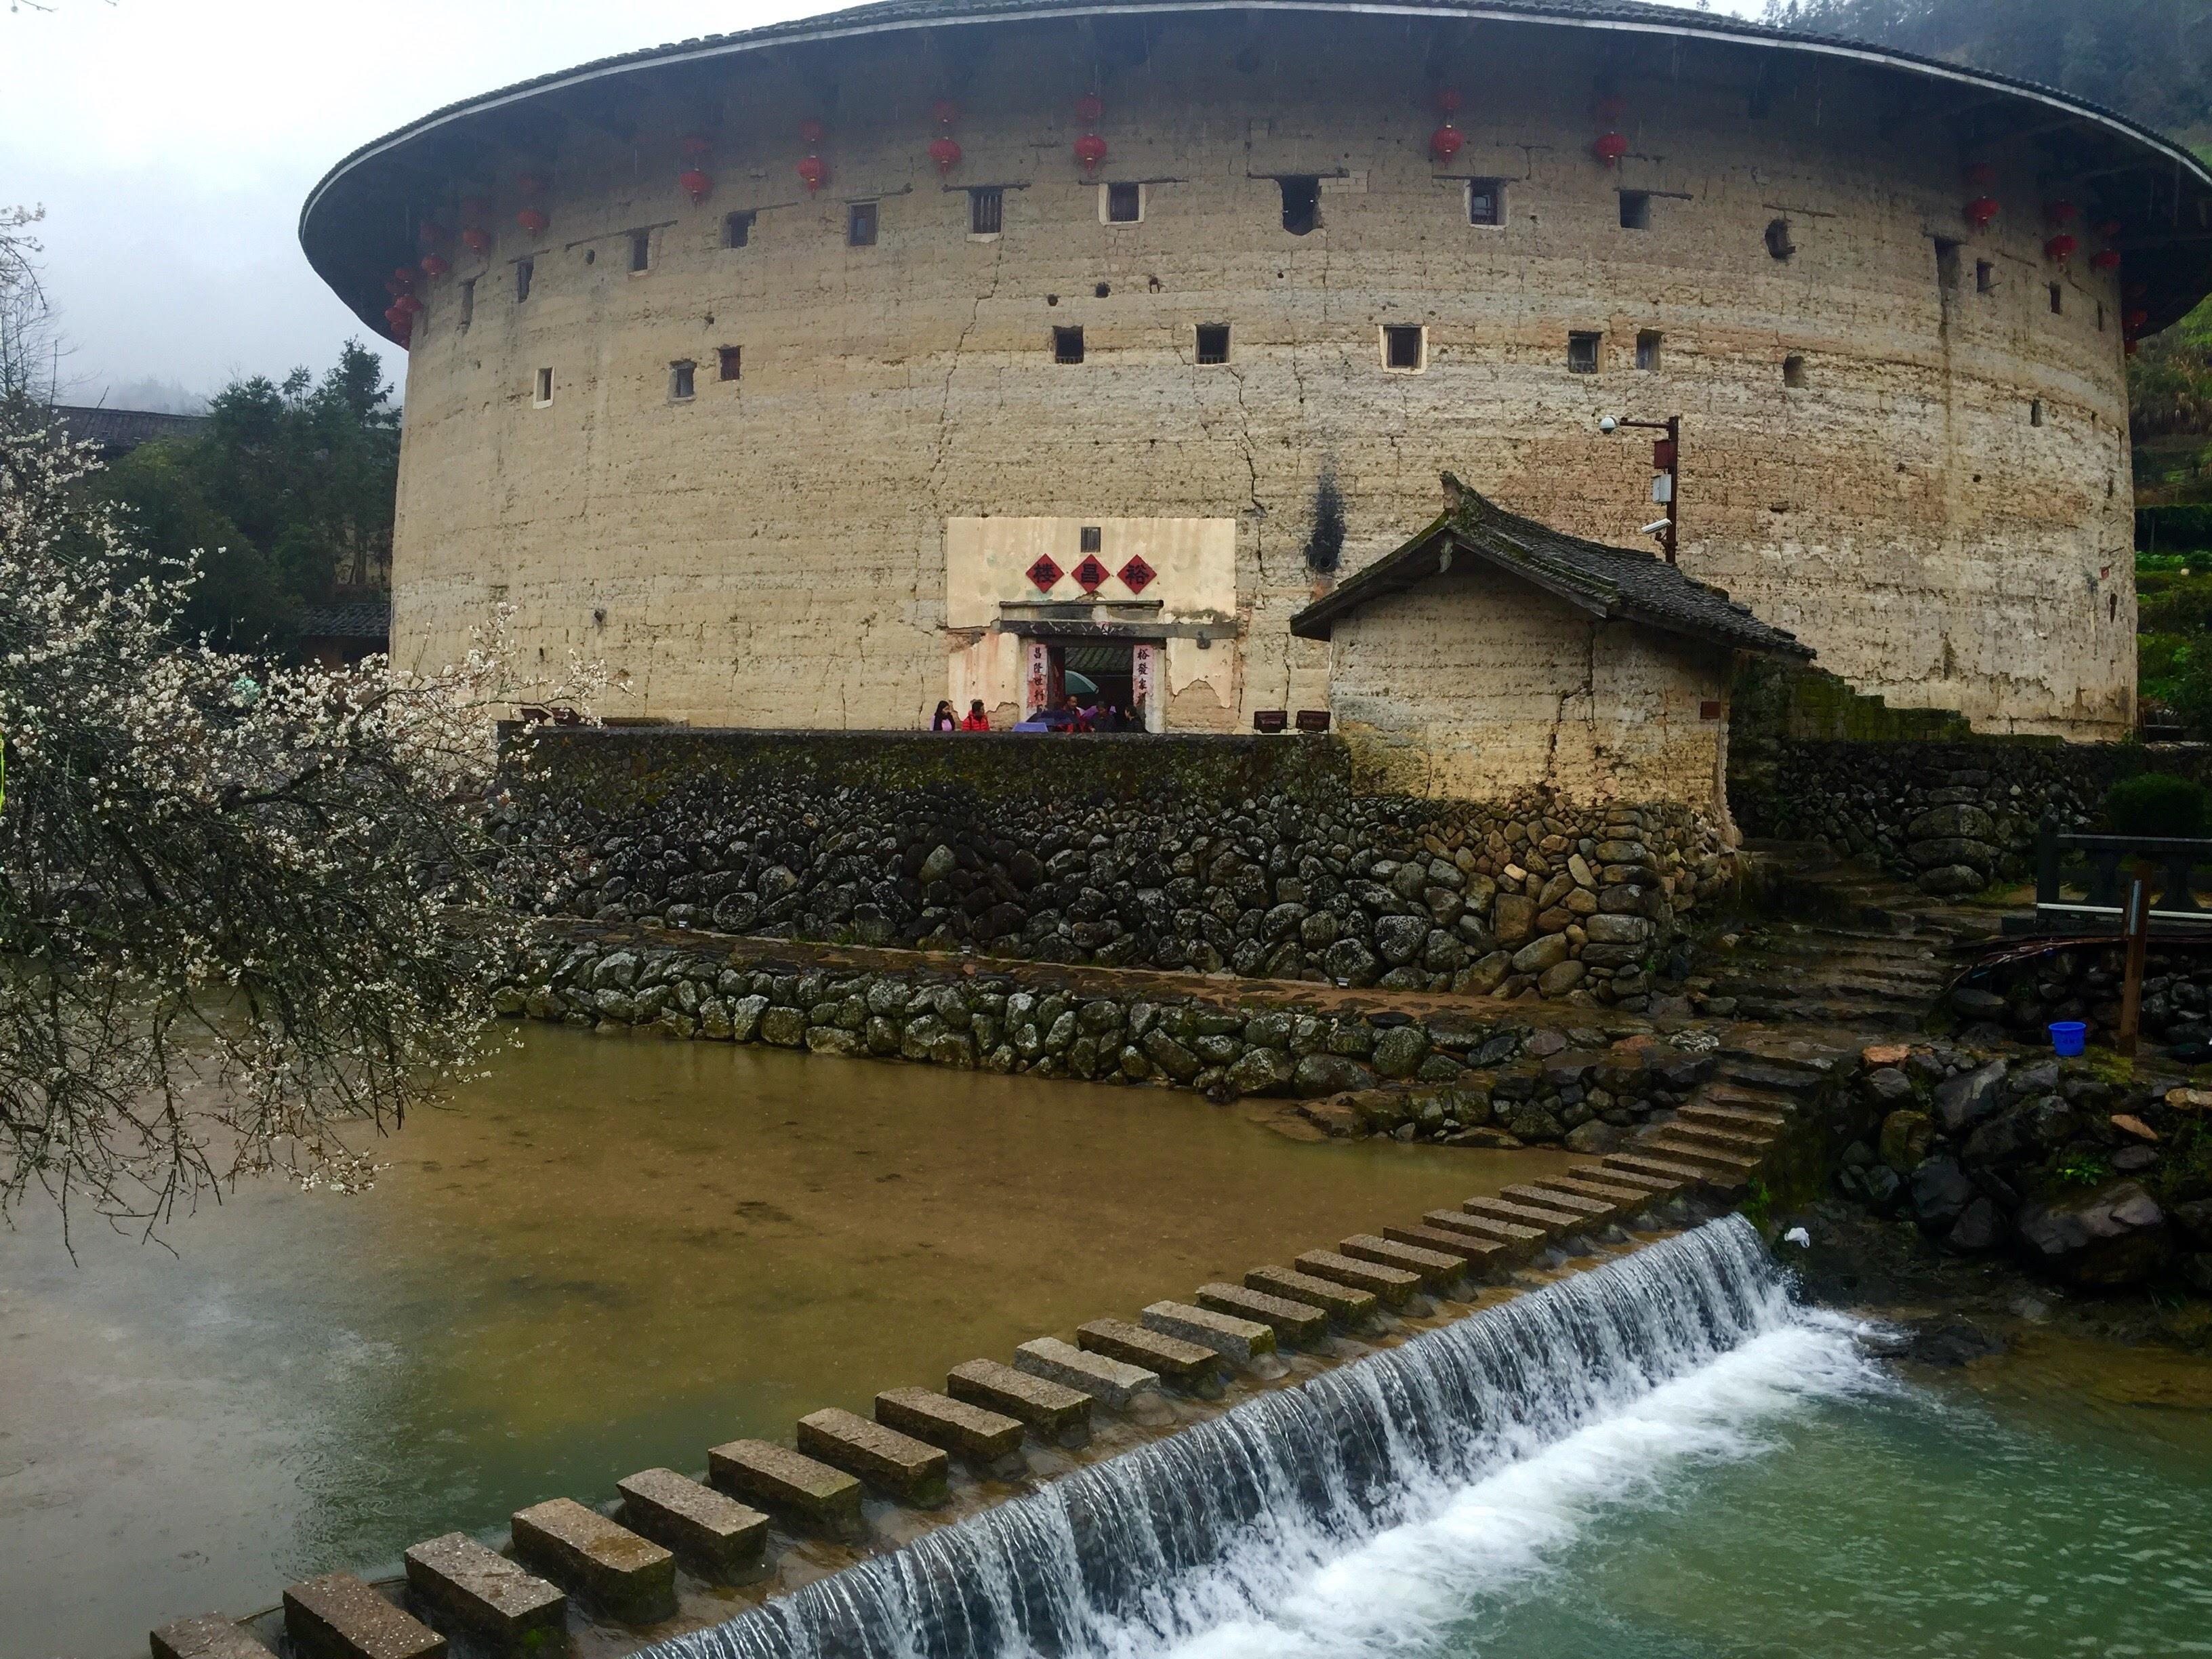 China earthen houses (tulou)